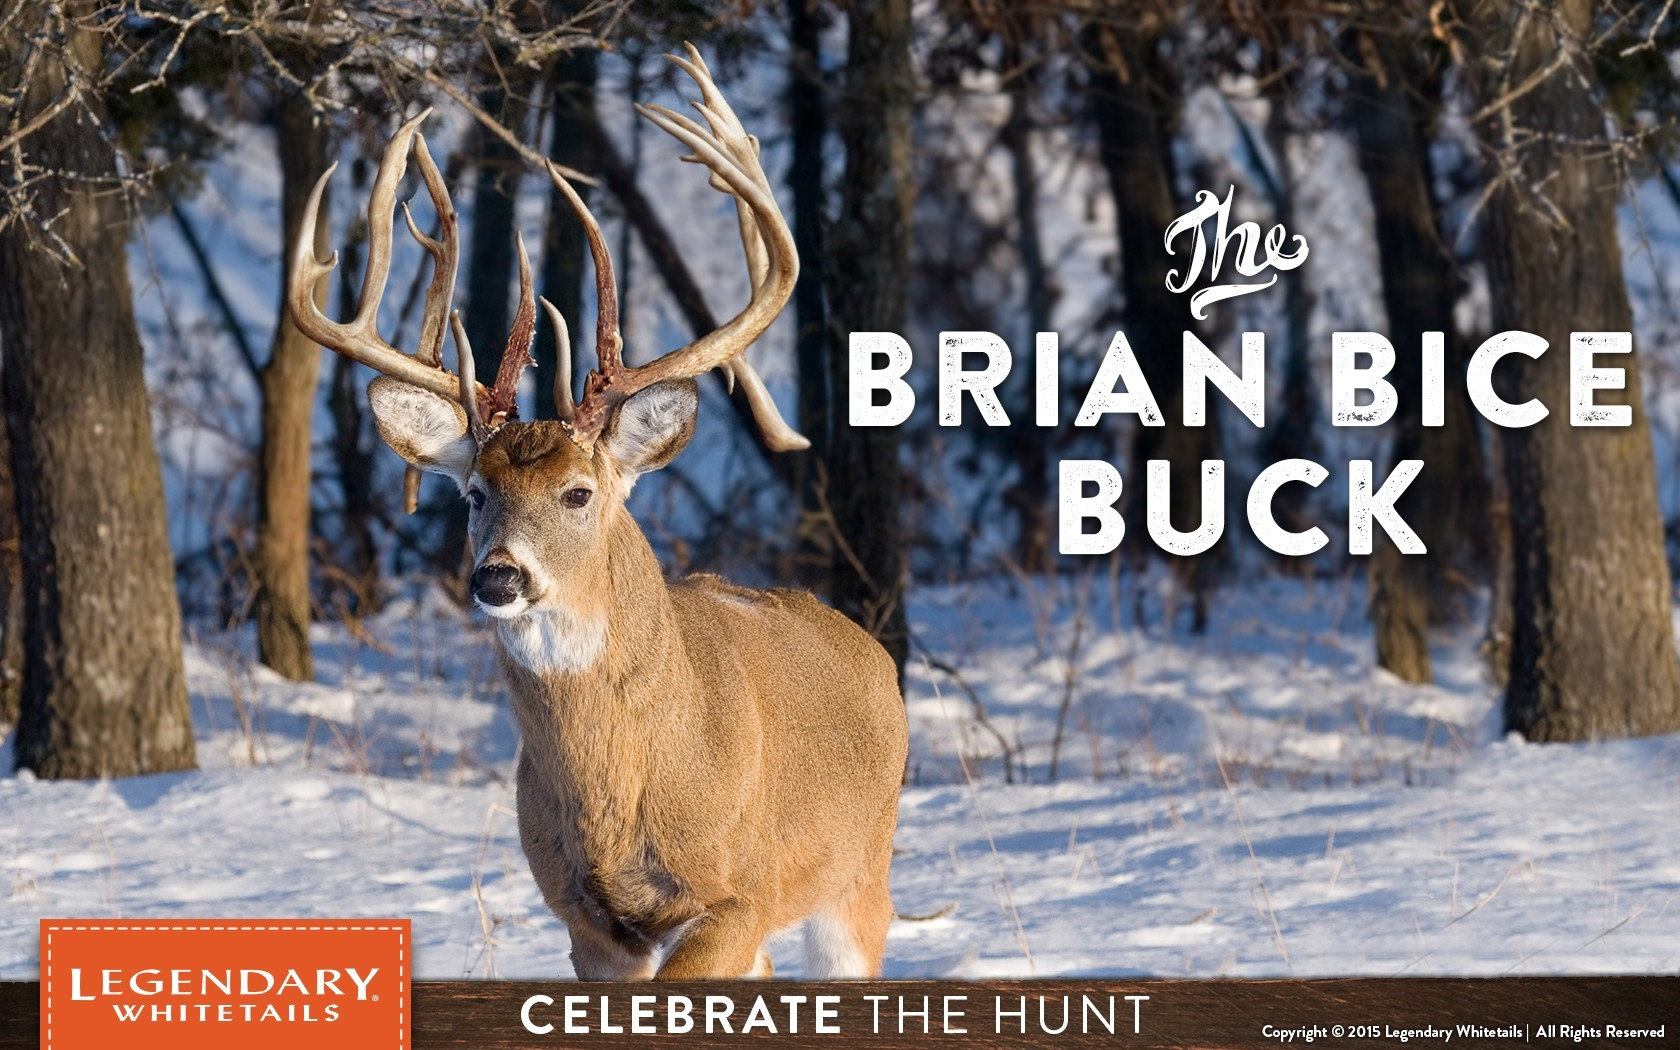 Brian Bice Buck - Legendary Whitetail'S Blog - Legendary Whitetail'S Blog-Midwest 2021 Whitetail Rut Predictions